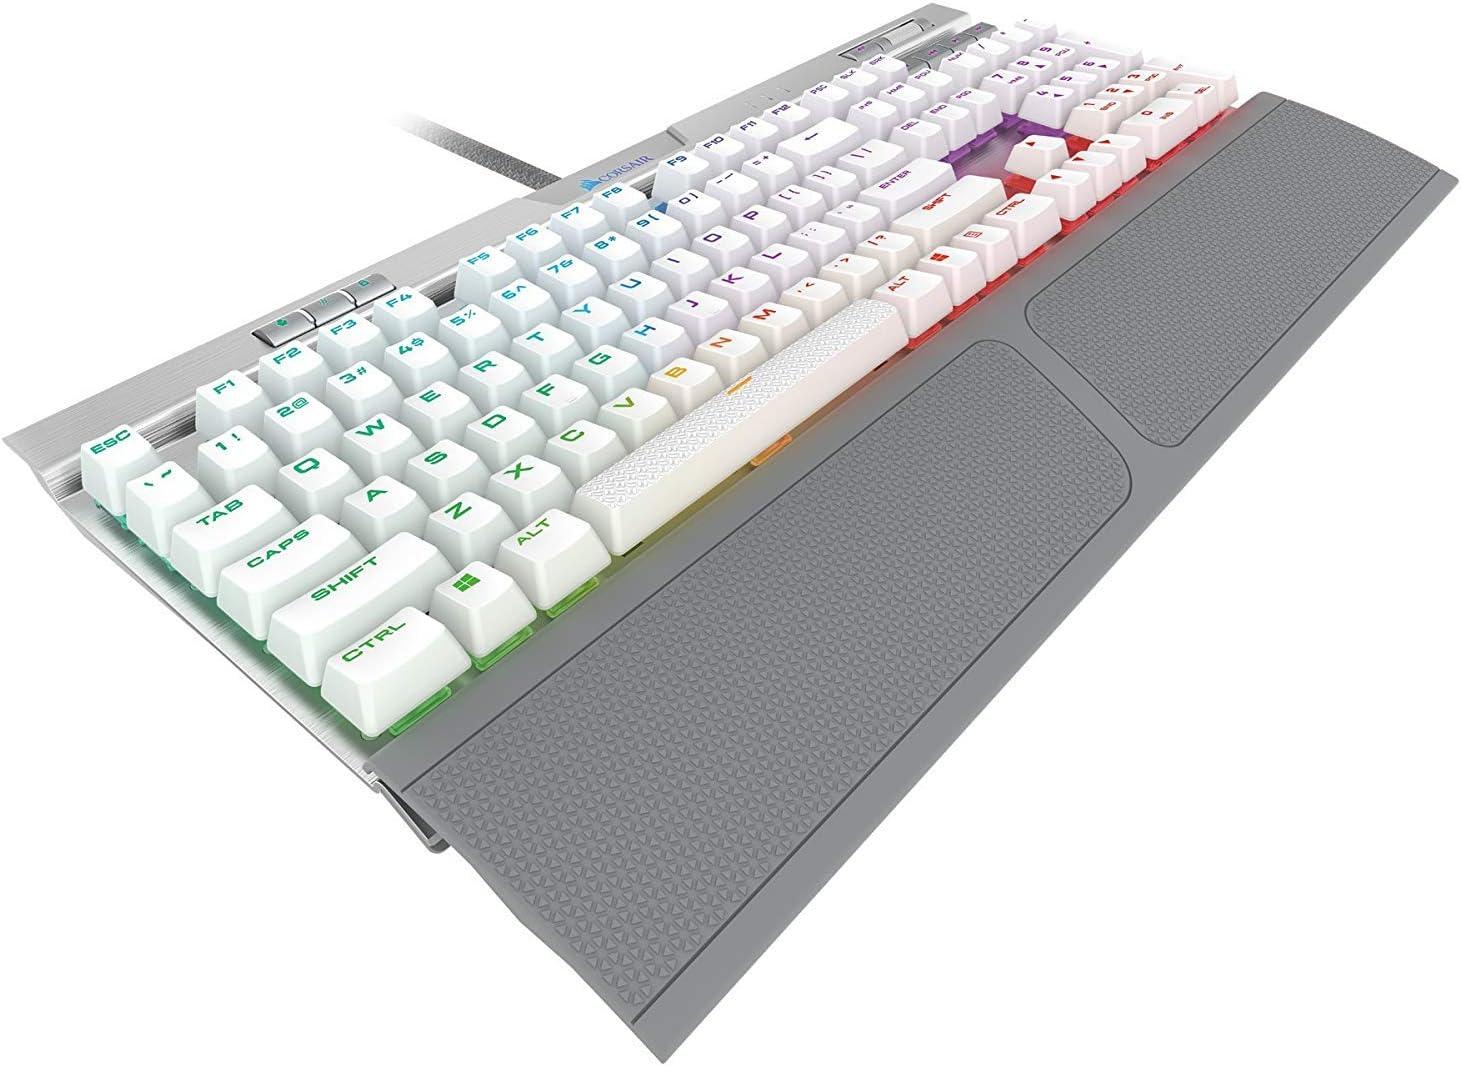 Corsair K70 RGB MK.2 SE Mechanical RAPIDFIRE Gaming Keyboard - USB Passthrough & Media Controls - PBT Double-Shot Keycaps - Cherry MX Speed - RGB LED Backlit,CH-9109114-NA